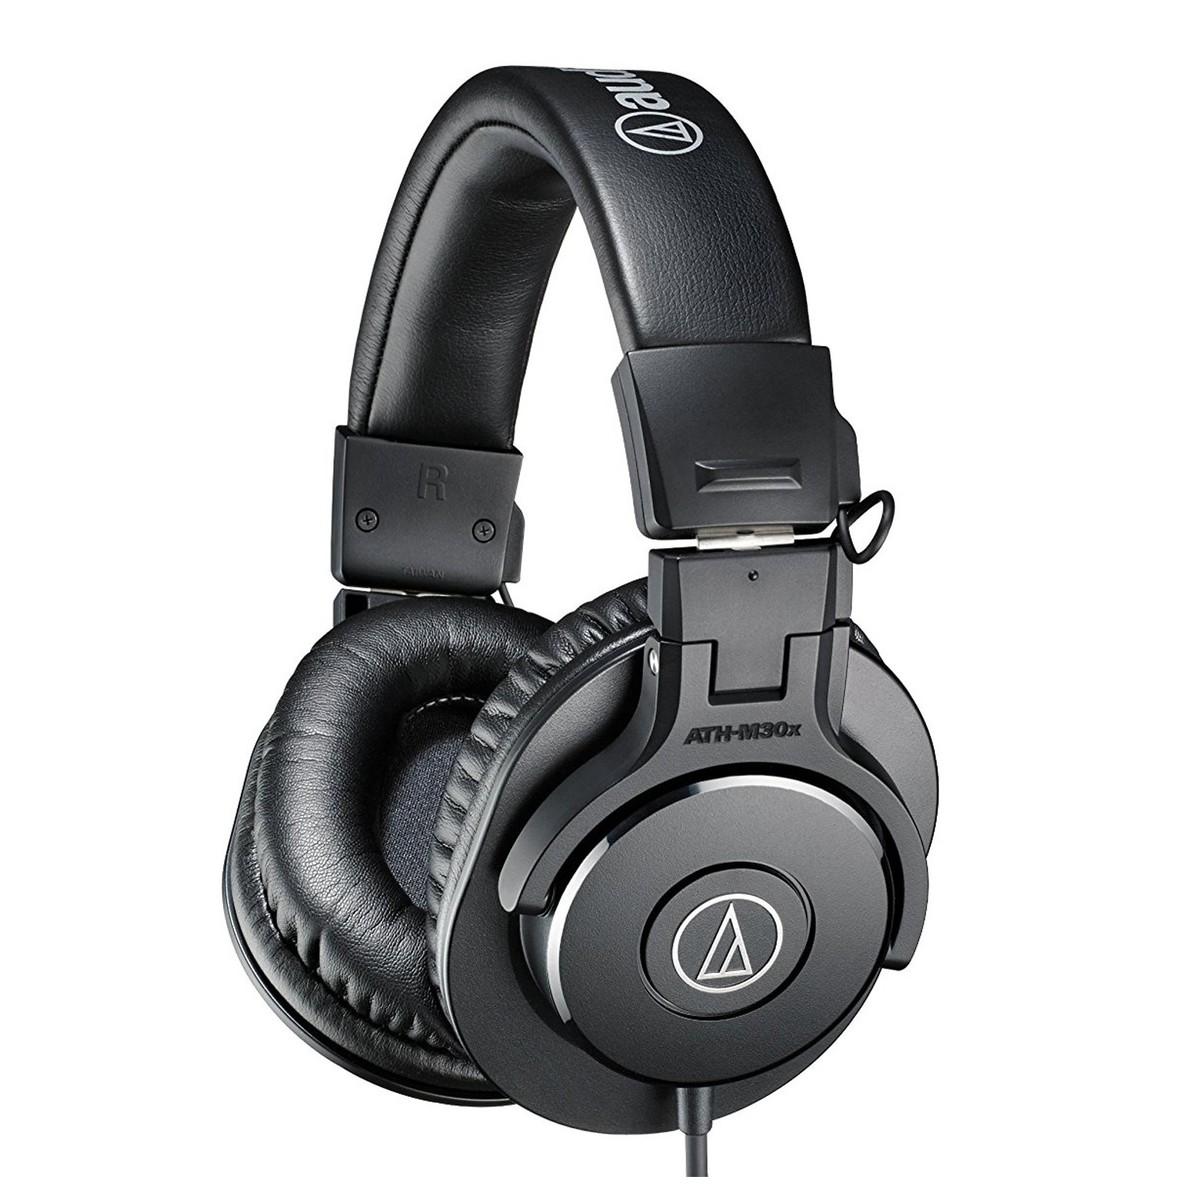 Headphones Audio Technica : audio technica ath m30x professional monitor headphones at gear4music ~ Hamham.info Haus und Dekorationen